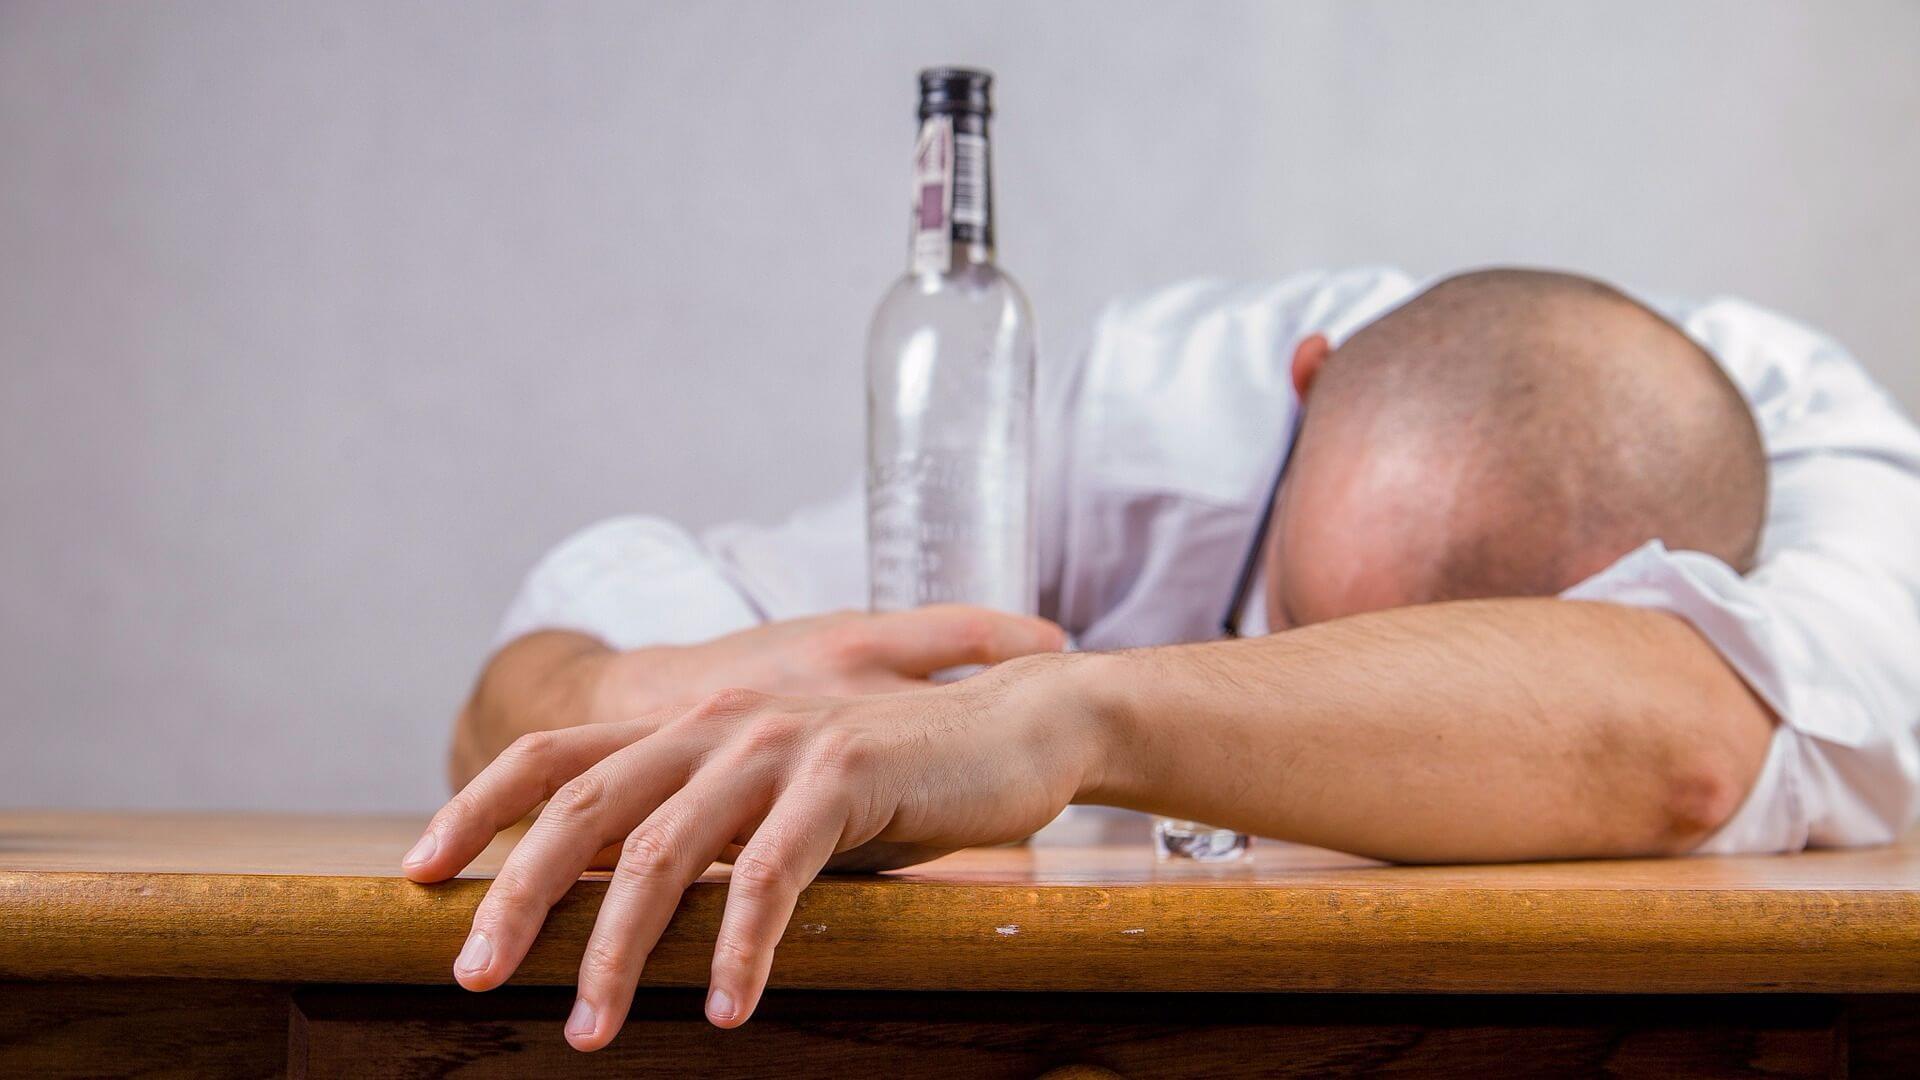 Спасти от алкоголизма дома лечение алкоголизма в перми стационар